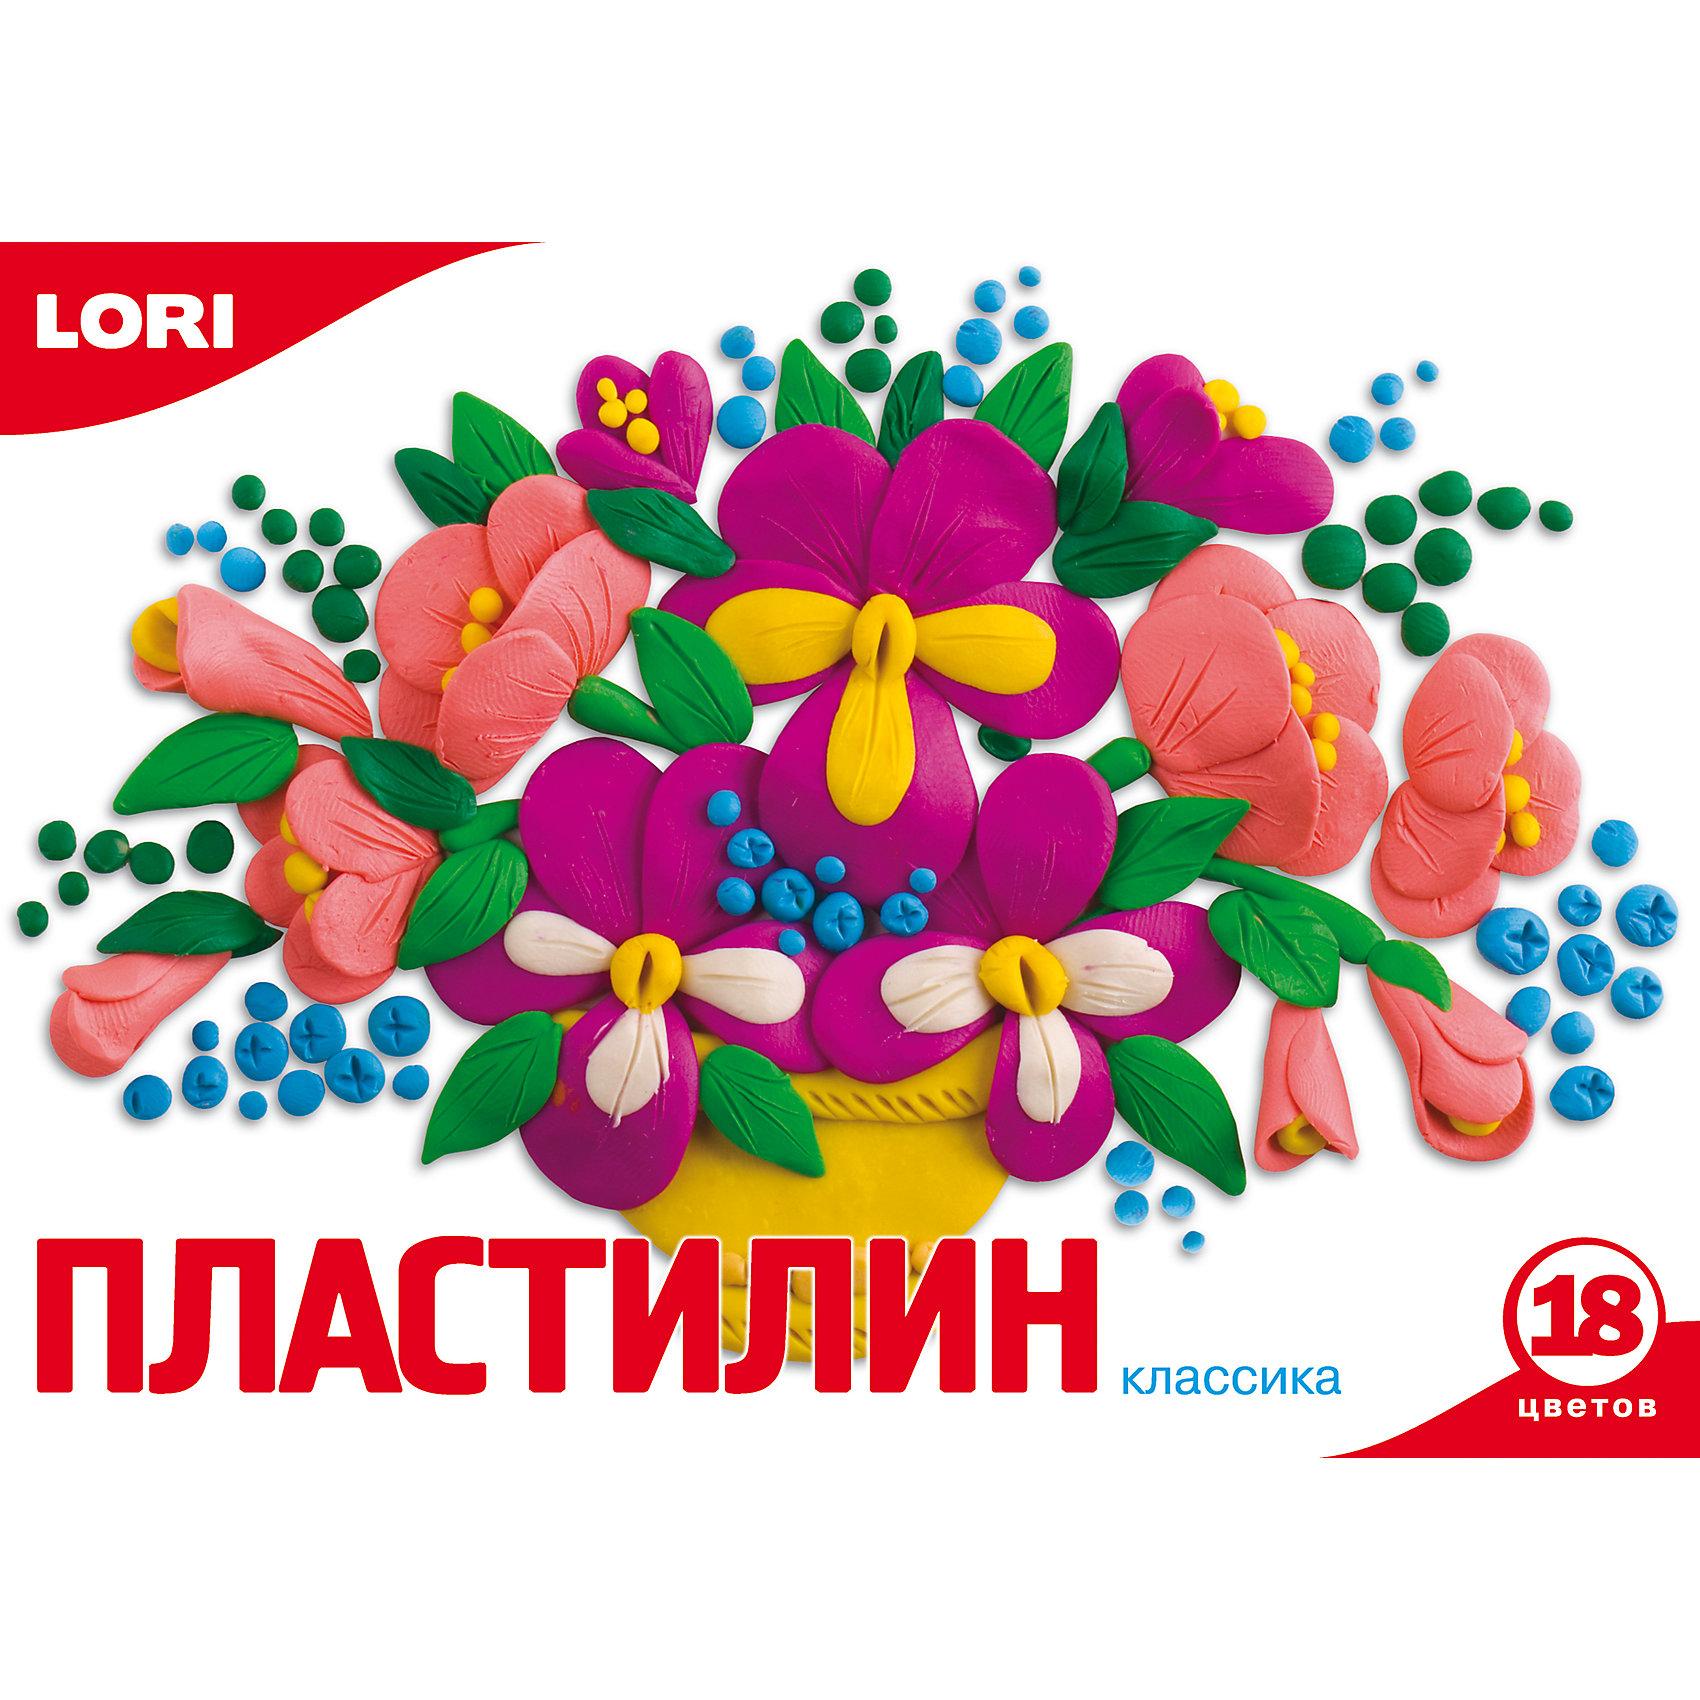 Пластилин «Классика»  18 цветов, 20 гЛепка<br>Пластилин 18 цв.,  360 гр., стек<br><br>Ширина мм: 225<br>Глубина мм: 145<br>Высота мм: 161<br>Вес г: 2558<br>Возраст от месяцев: 36<br>Возраст до месяцев: 84<br>Пол: Унисекс<br>Возраст: Детский<br>SKU: 5032215